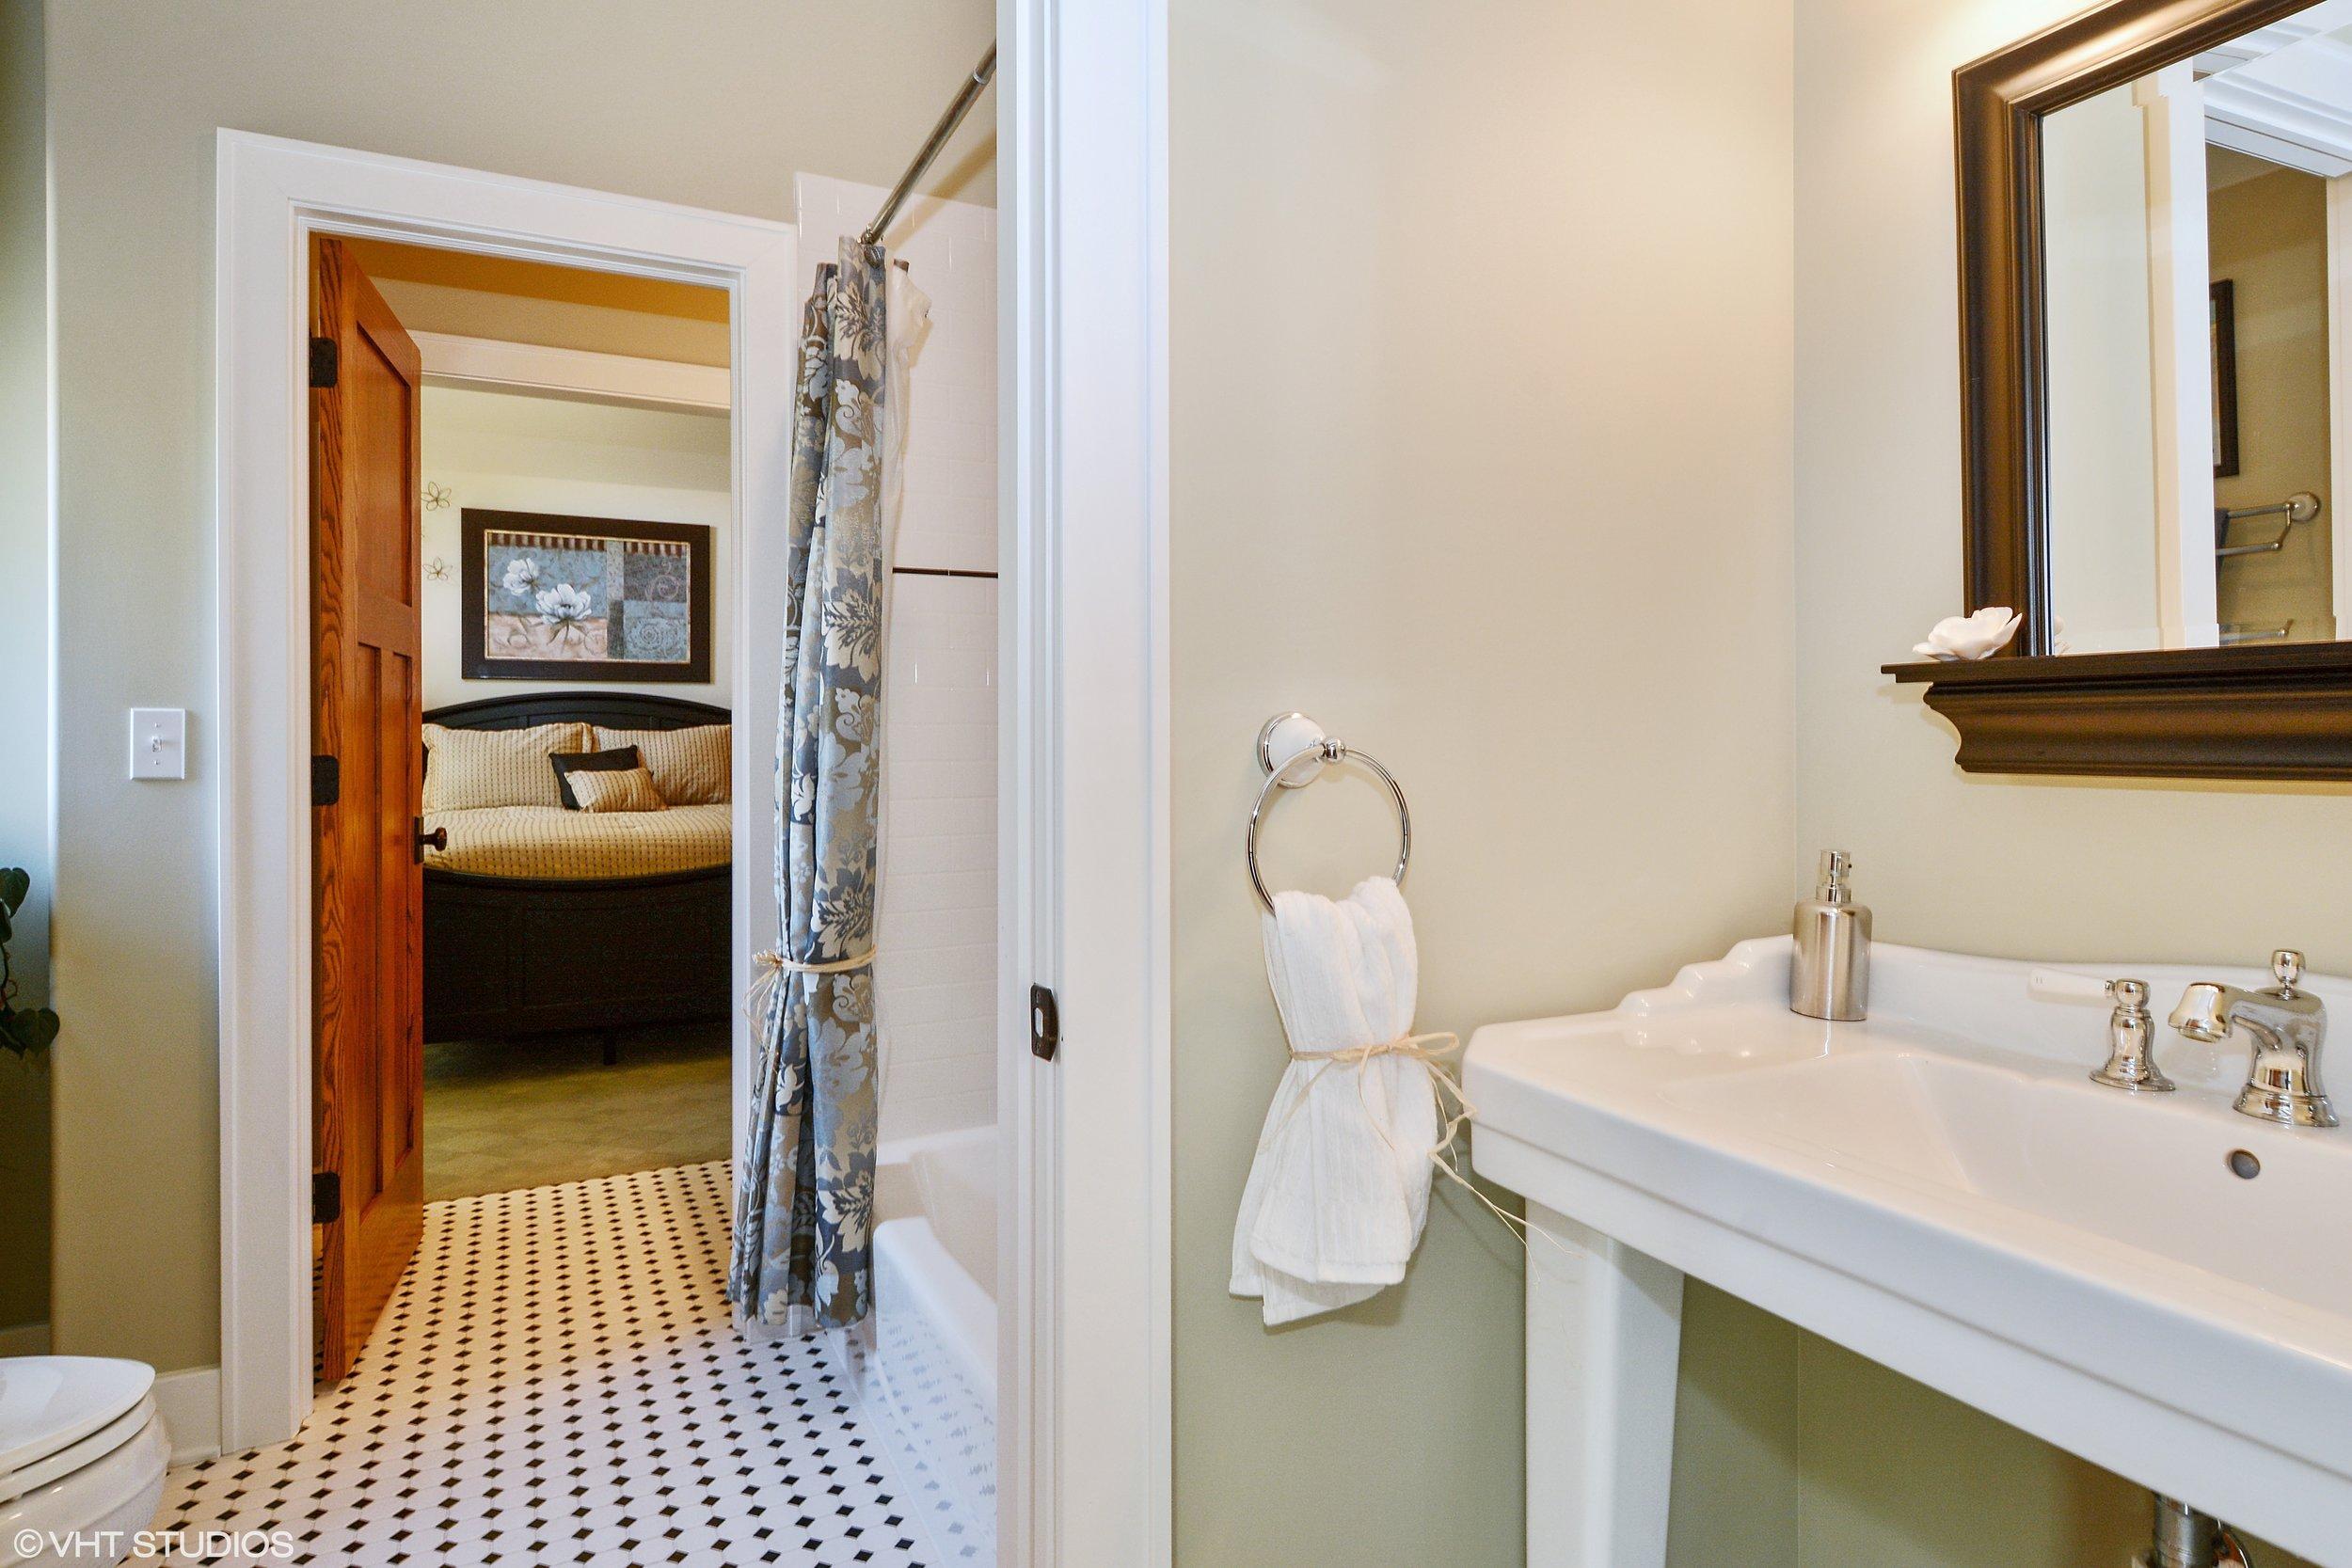 SHARED BATHROOM UPDATING GENEVA IL